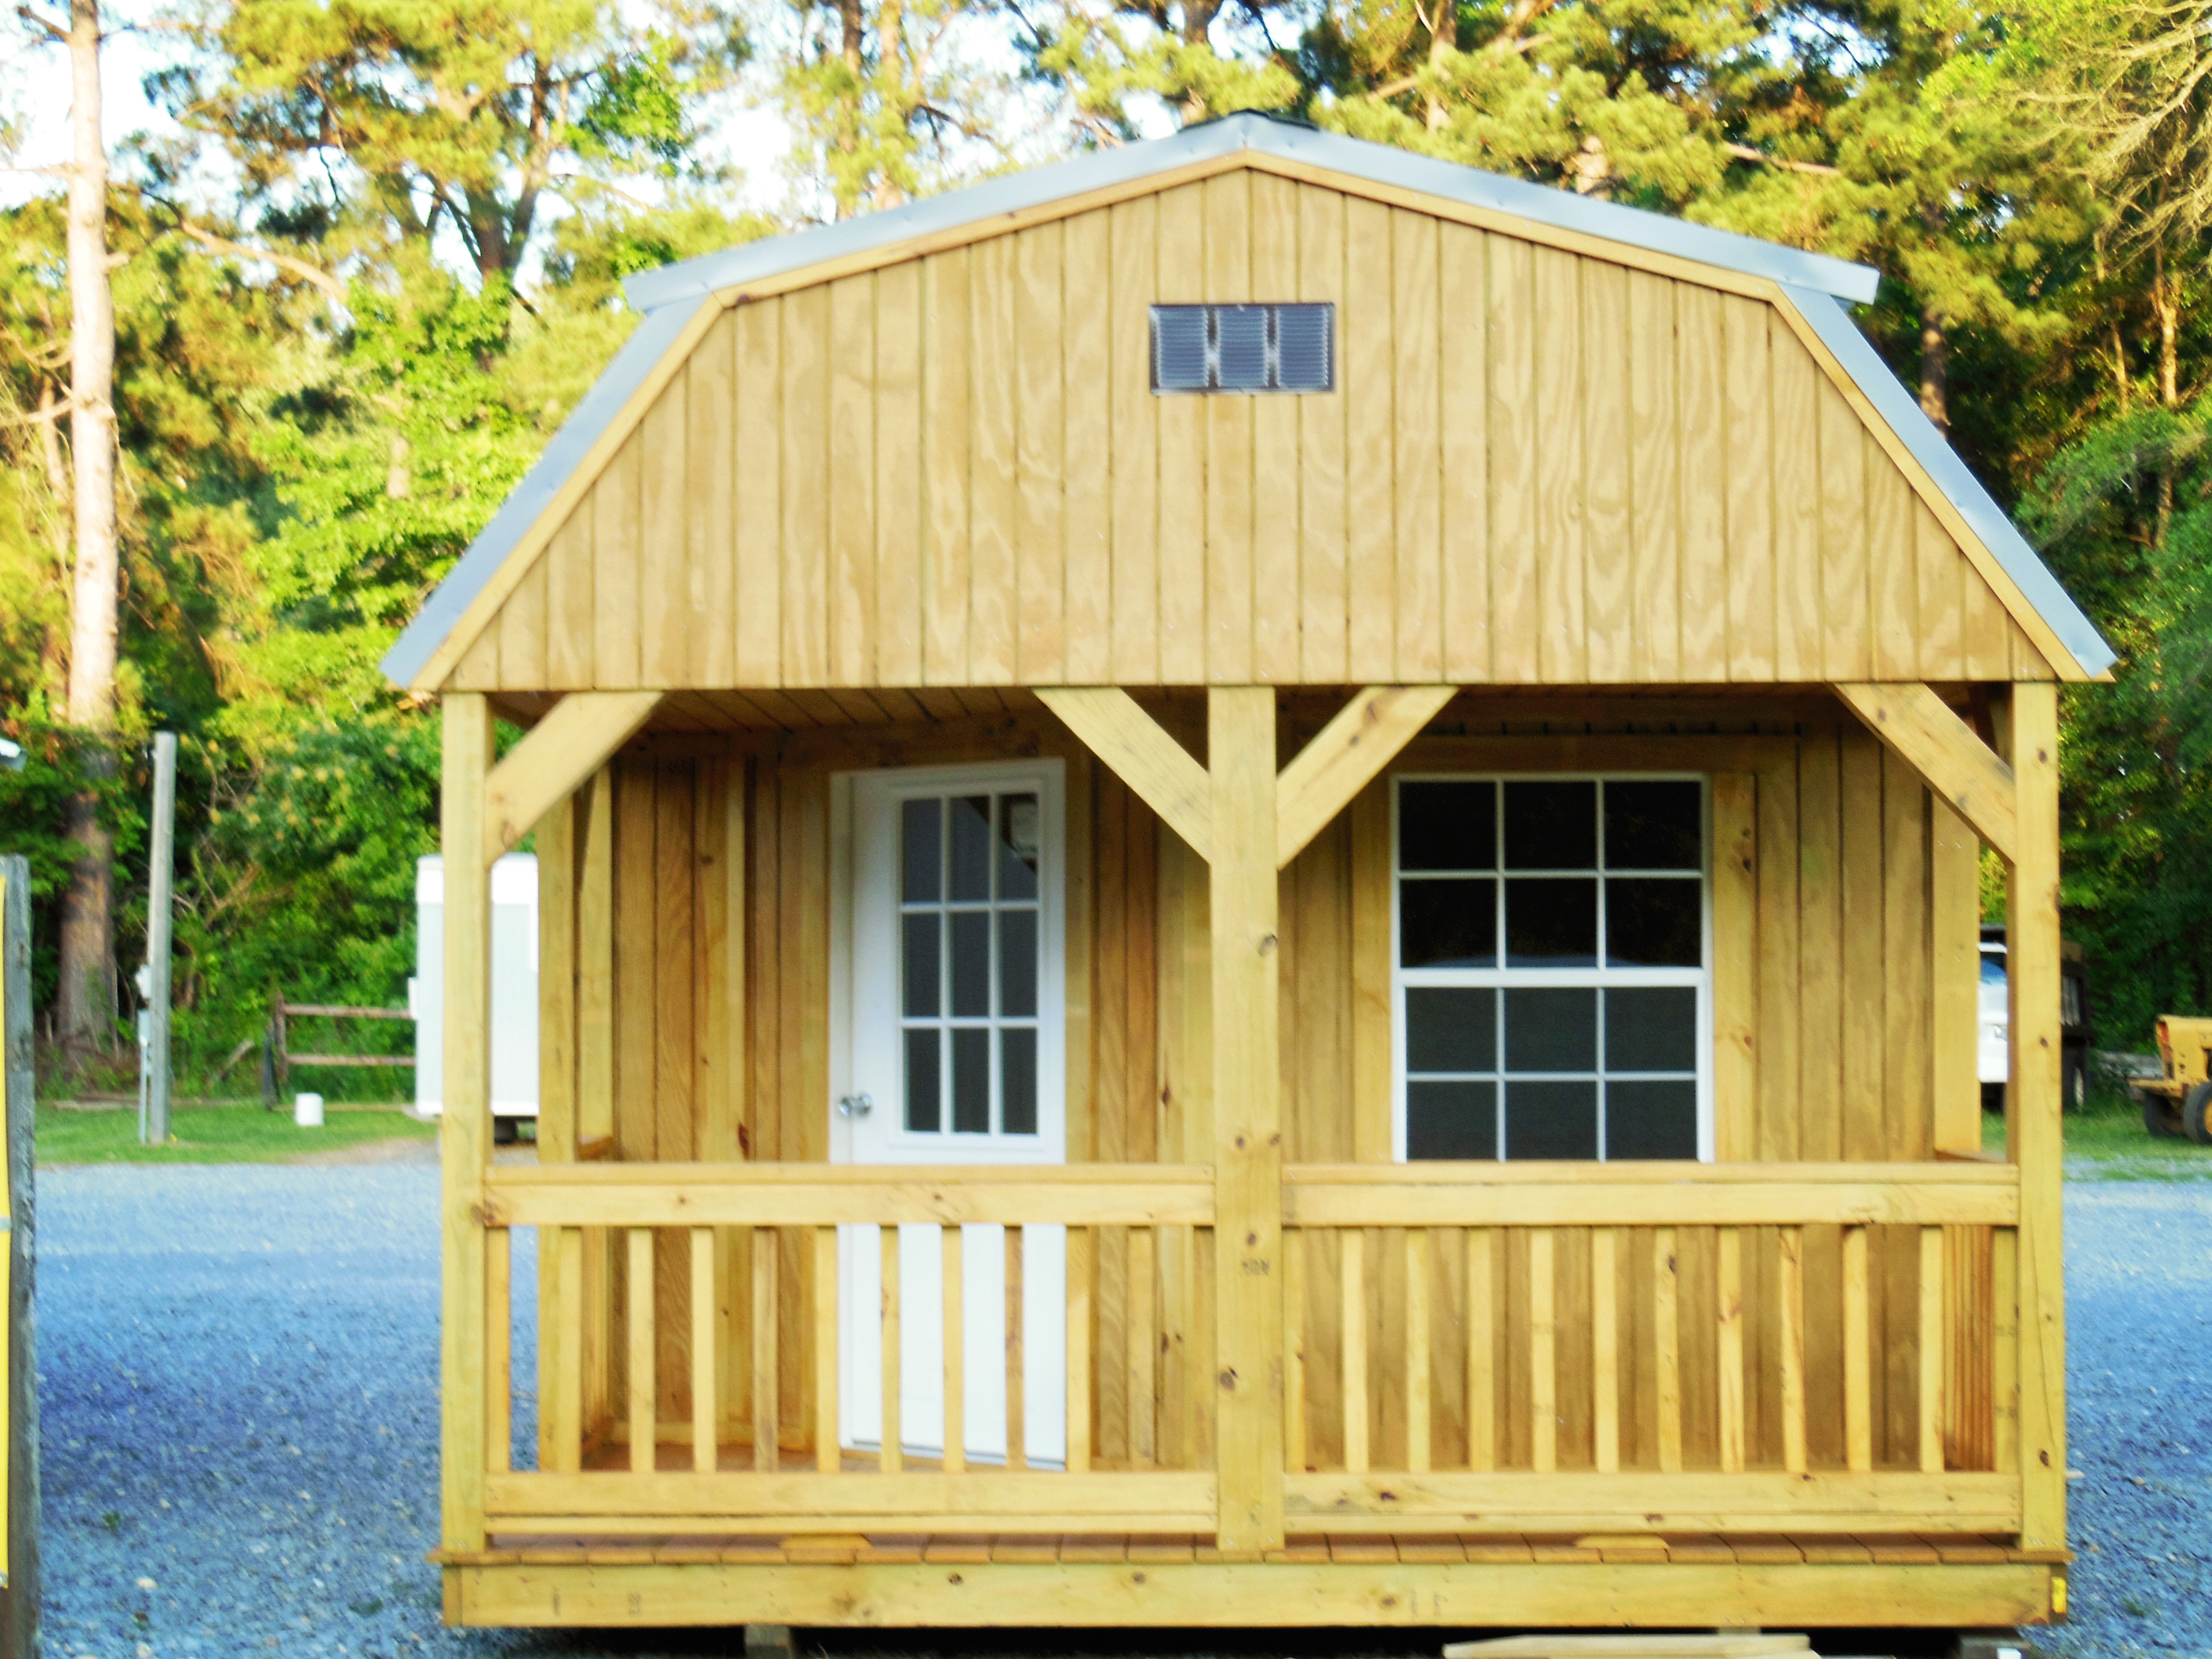 Deluxe Lofted Barn Cabin